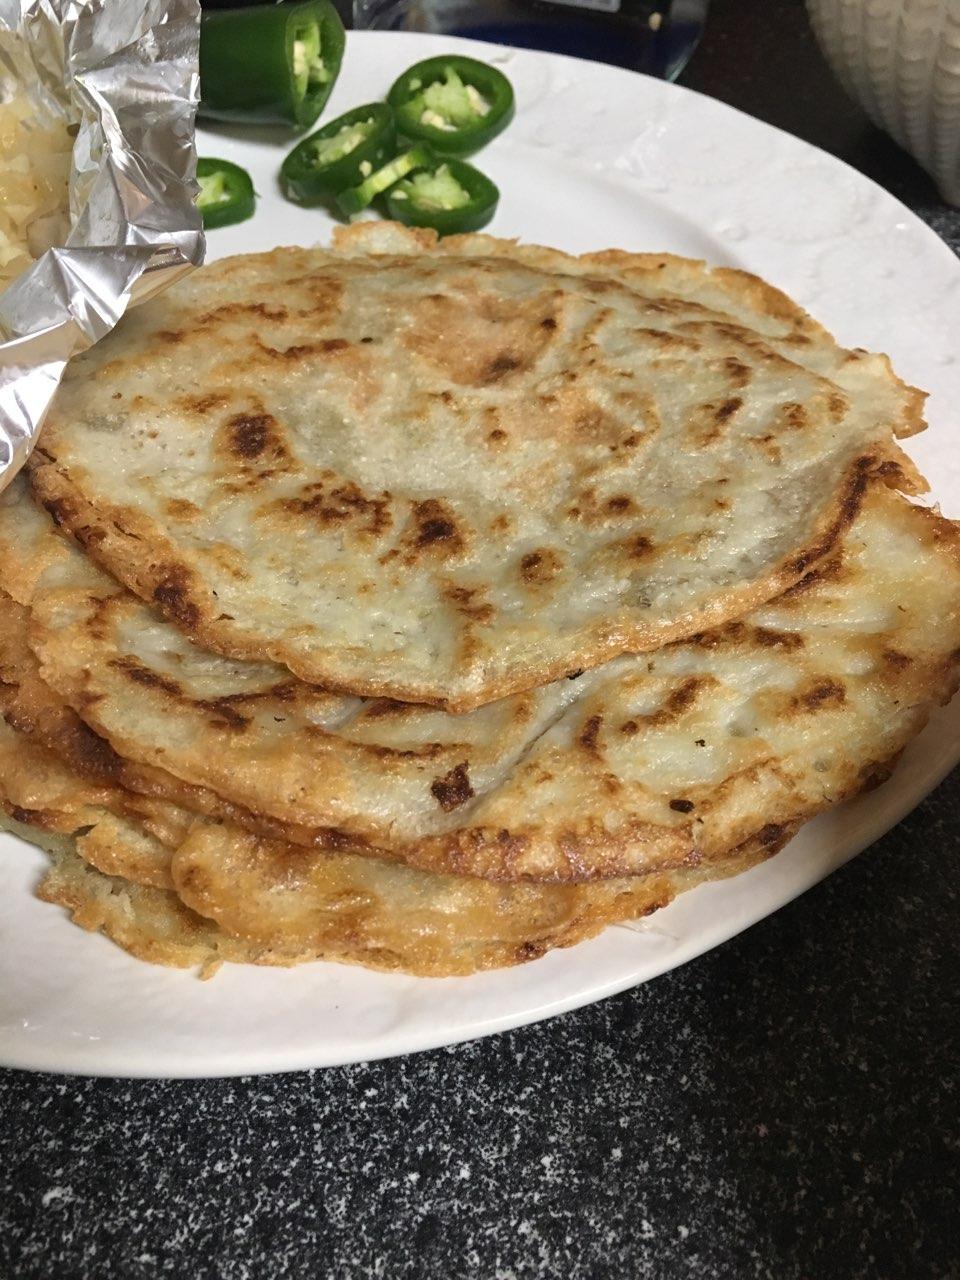 Arrowroot Starch Tortillas